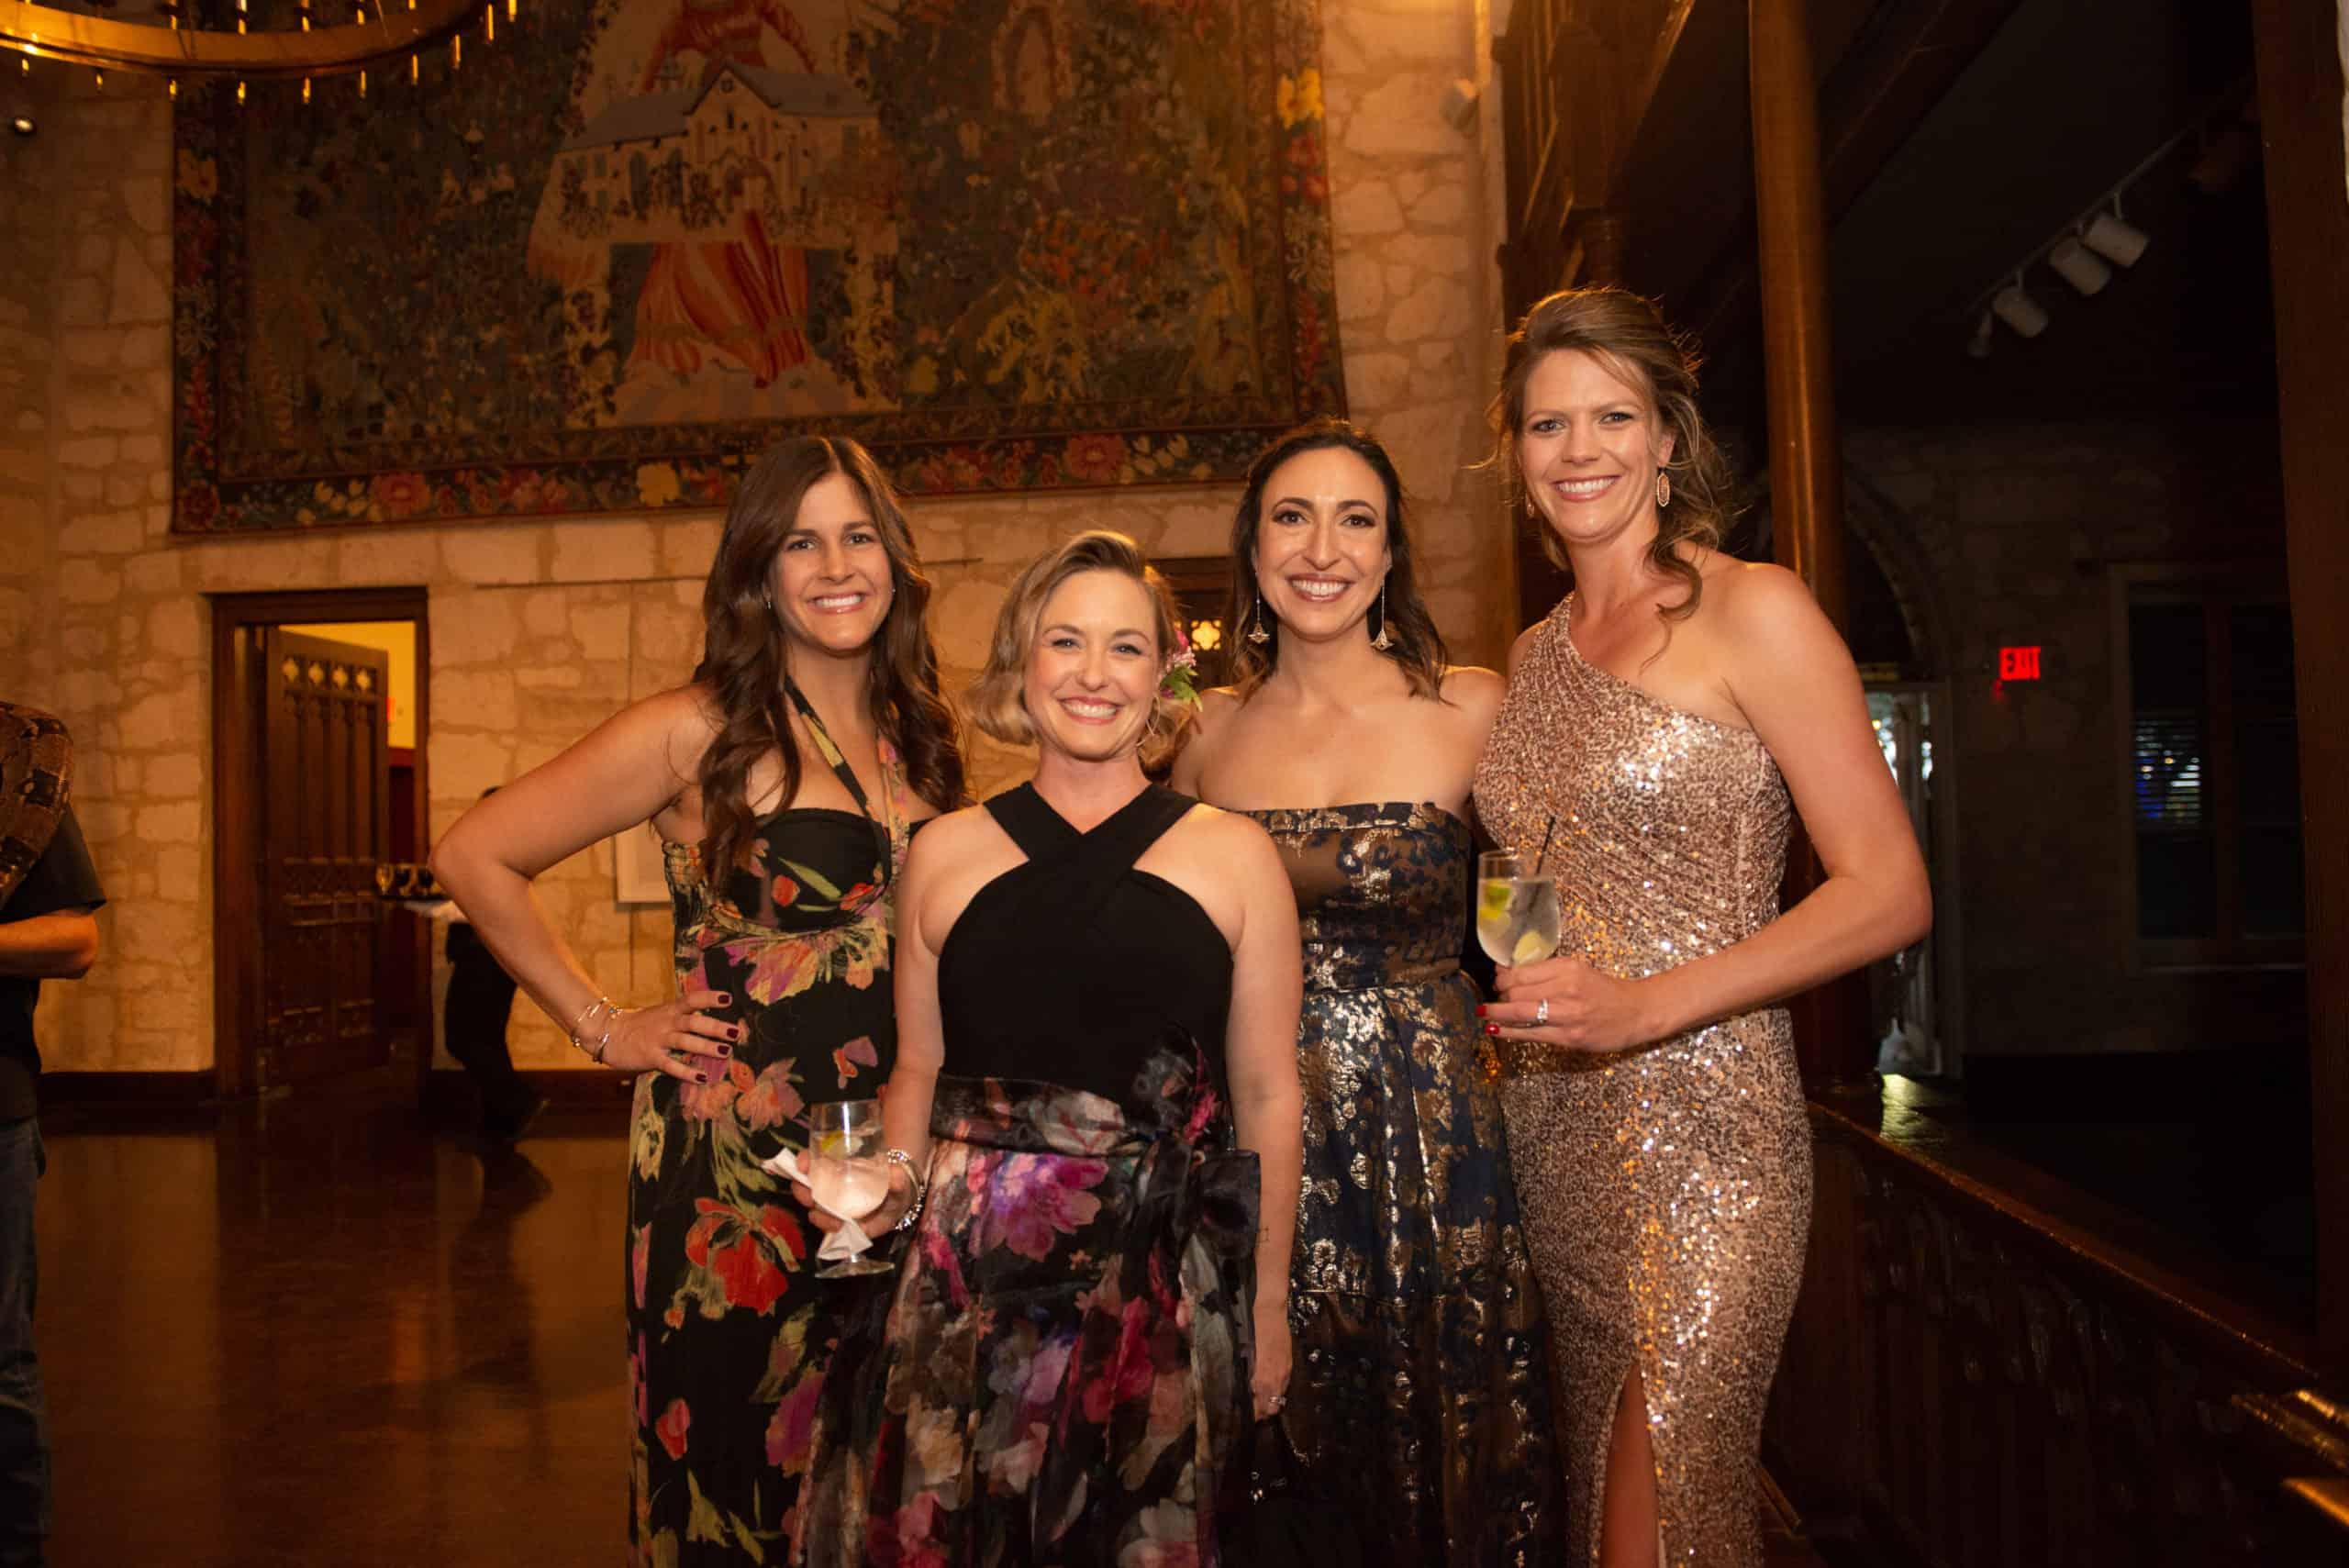 Krissy Gorsuch, Jessica Mewborne, Dr. Emily Marx and Bridgette Harkins